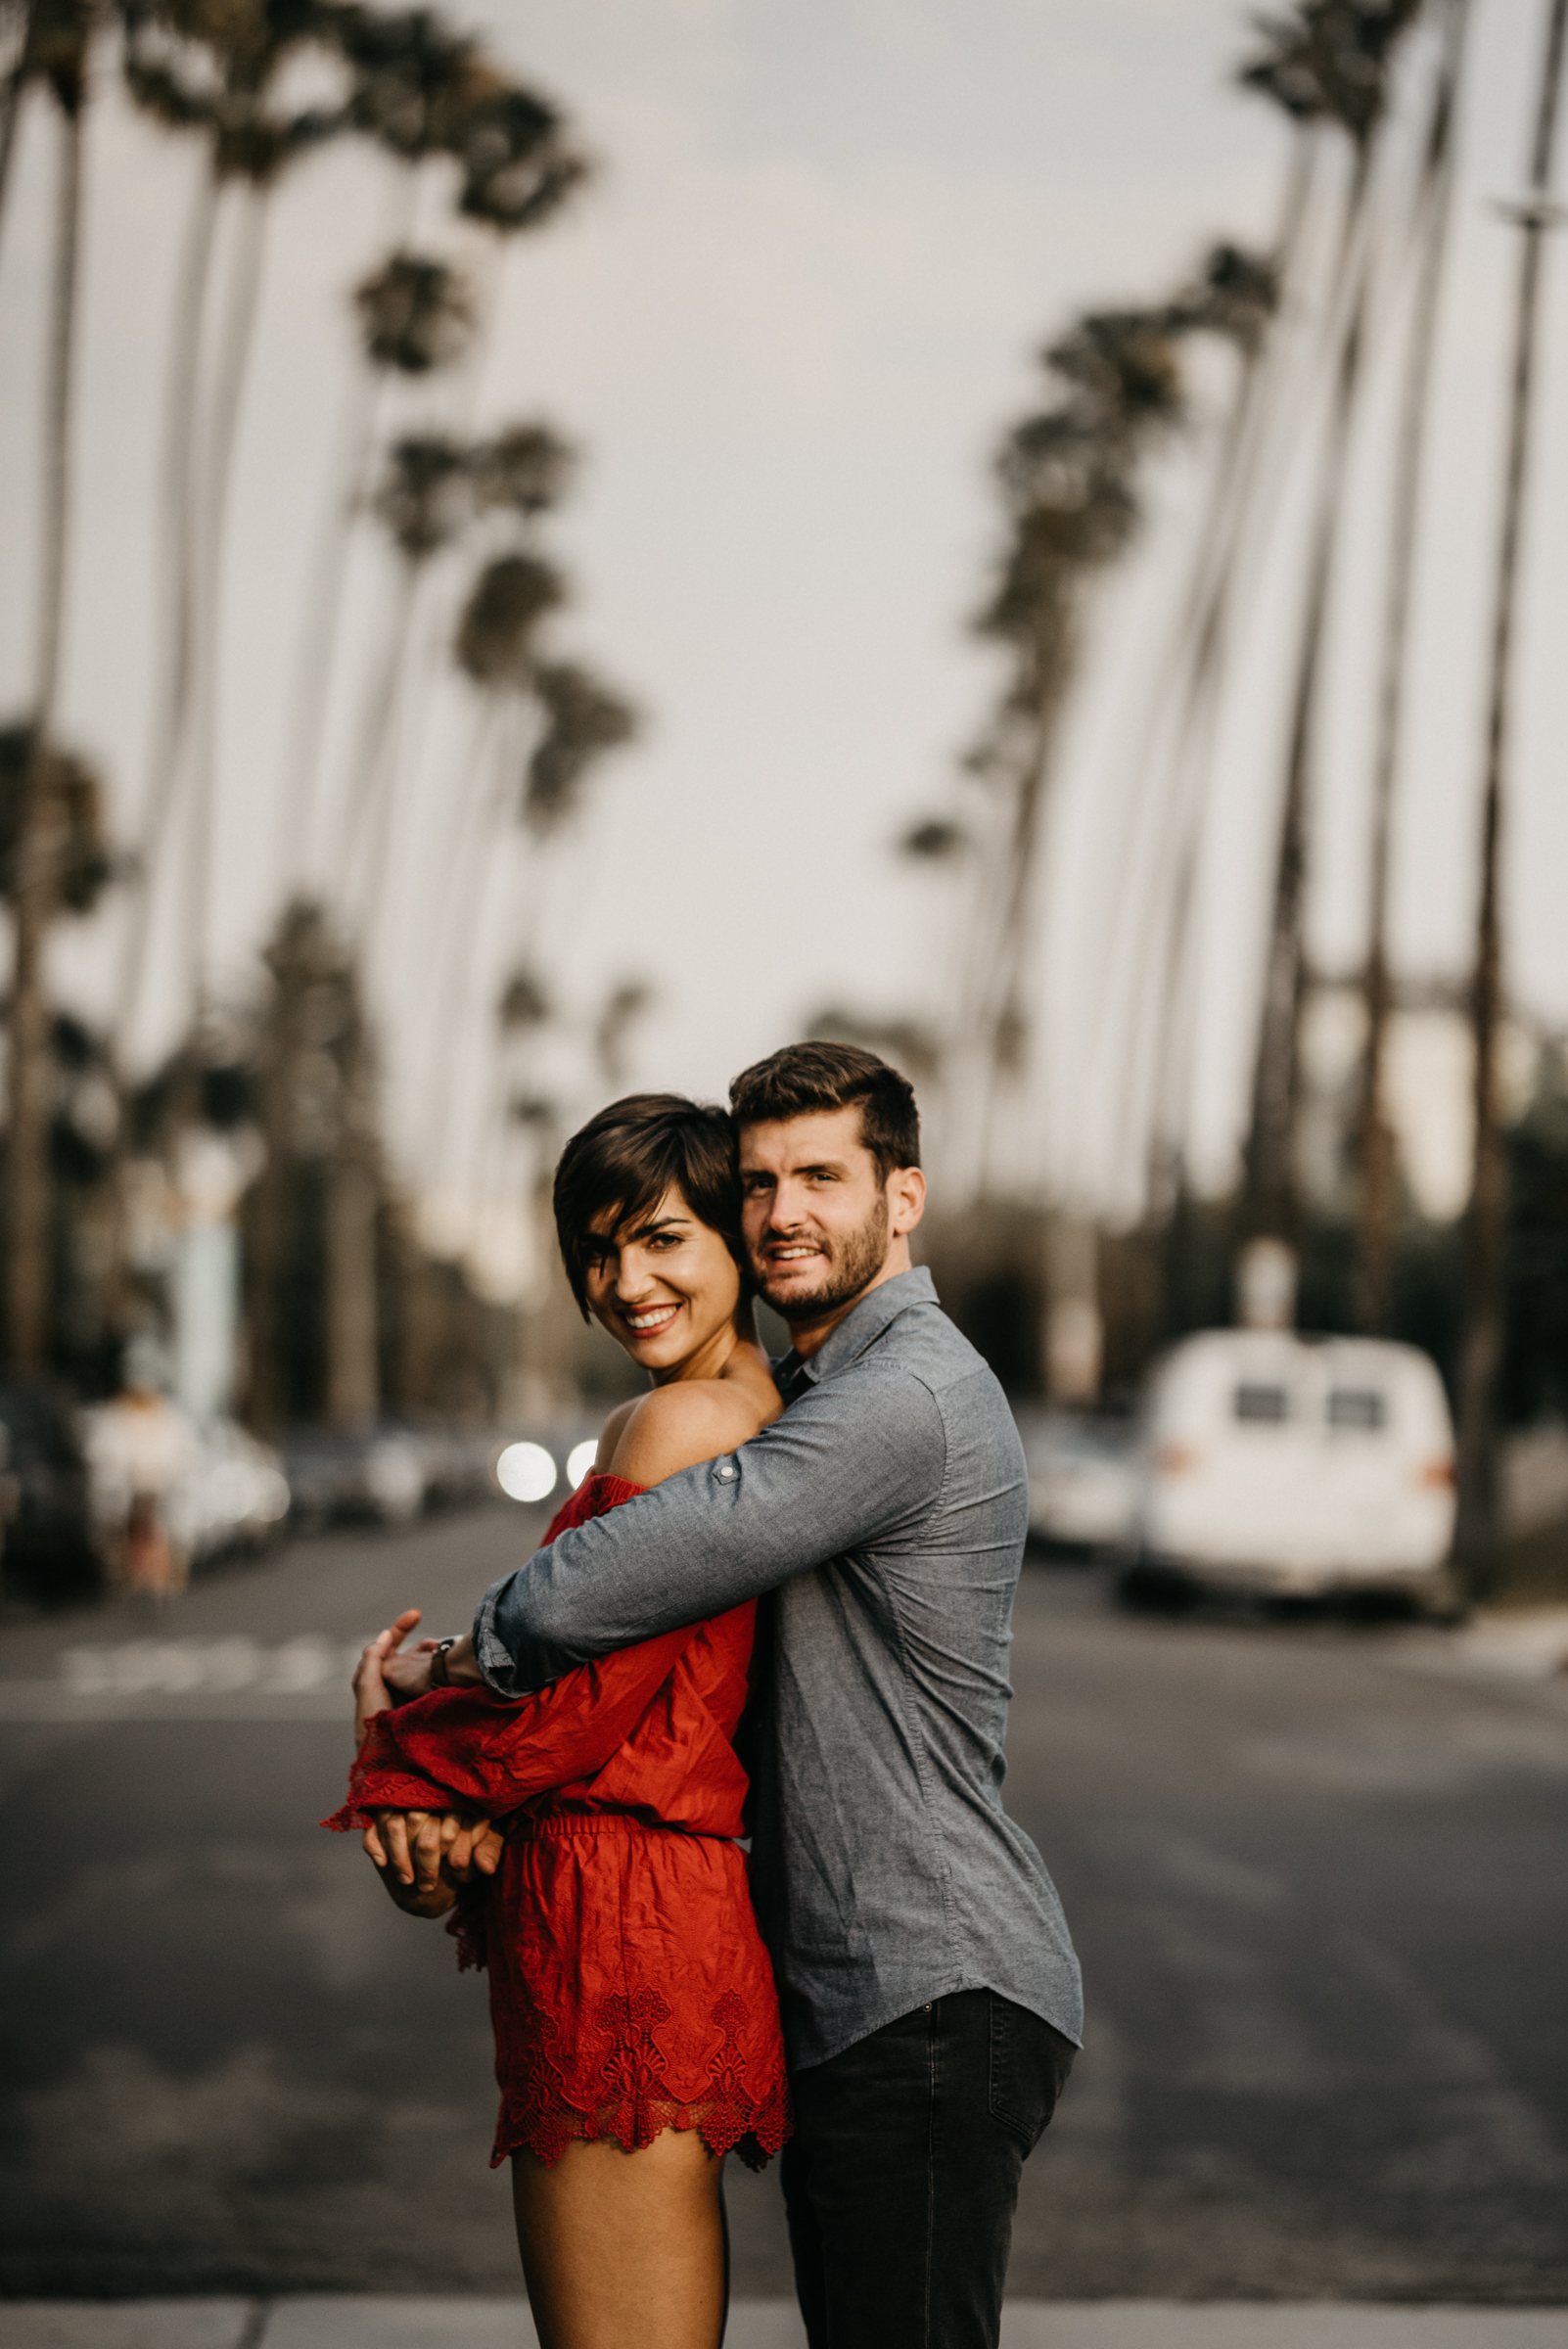 Isaiah + Taylor Photography - Santa Monica Engagement Session, Los Angeles Wedding Photographer-004.jpg